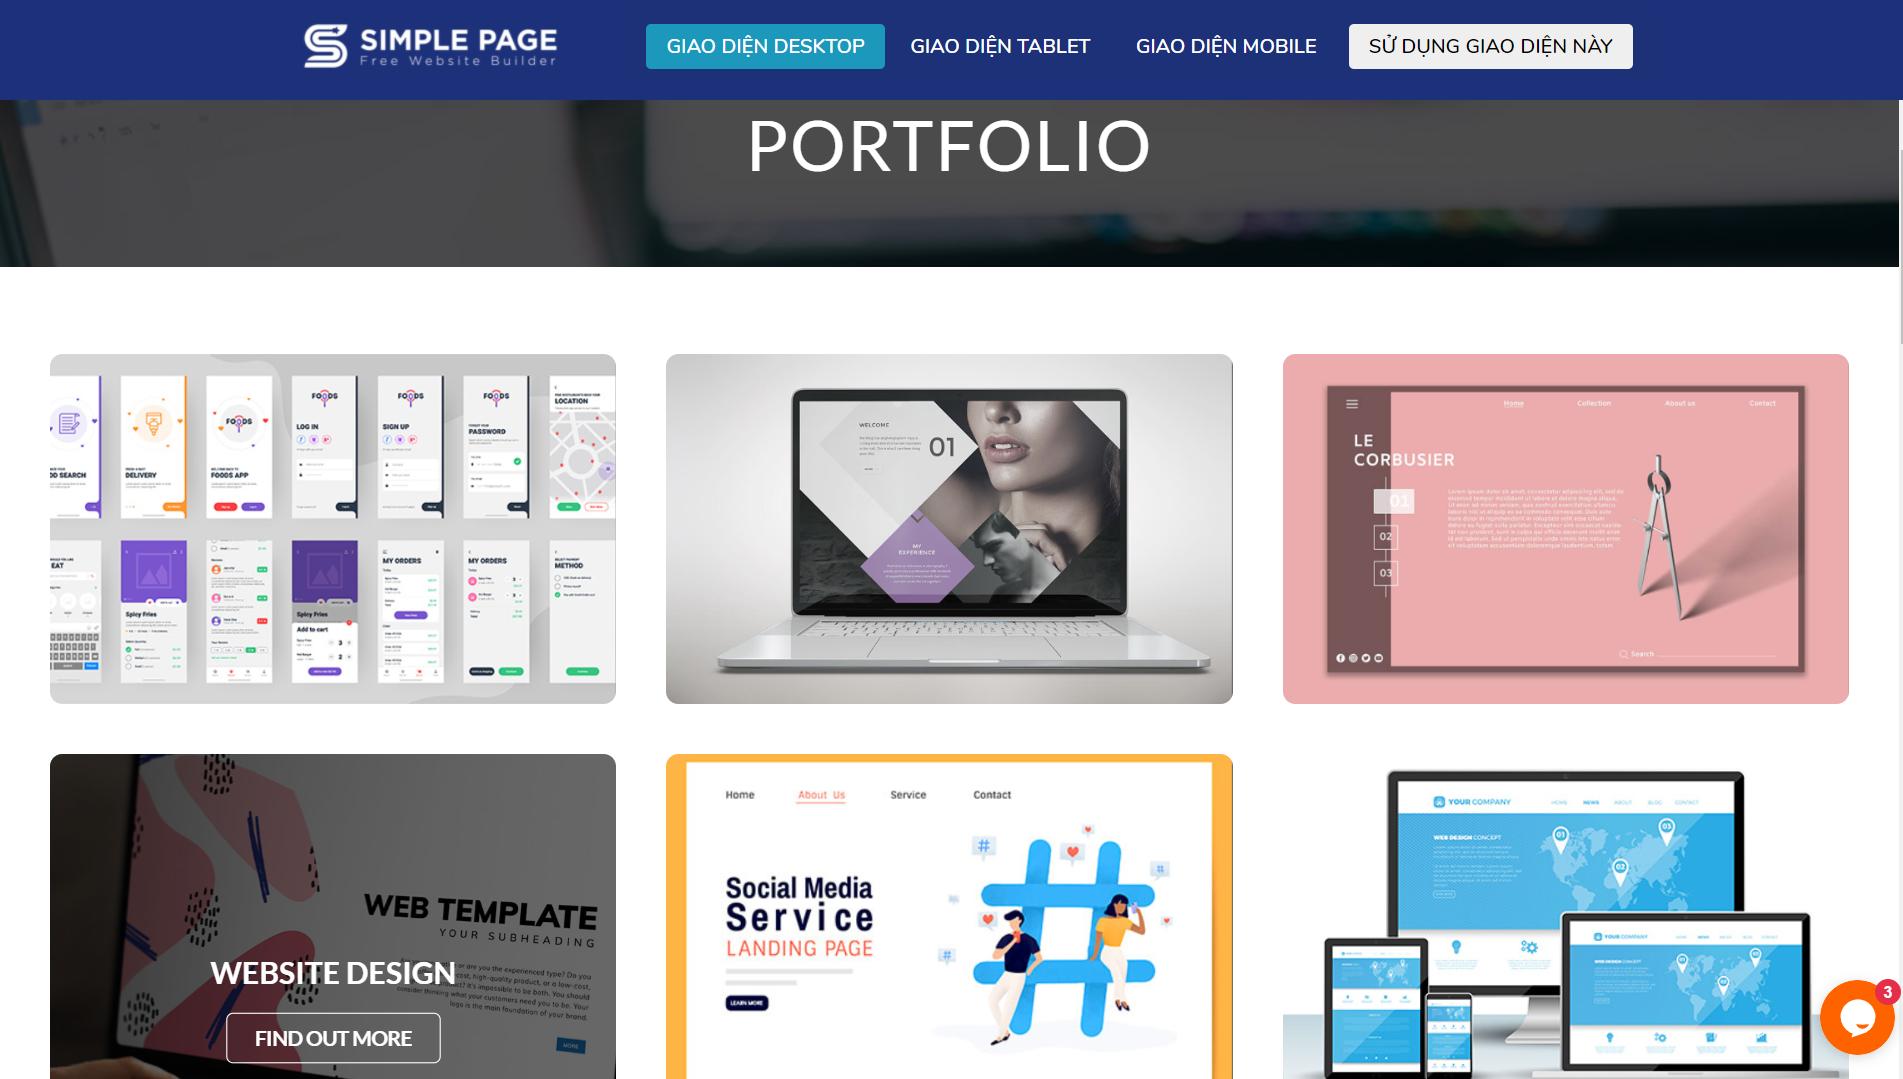 Mẫu landing page portfolio-1